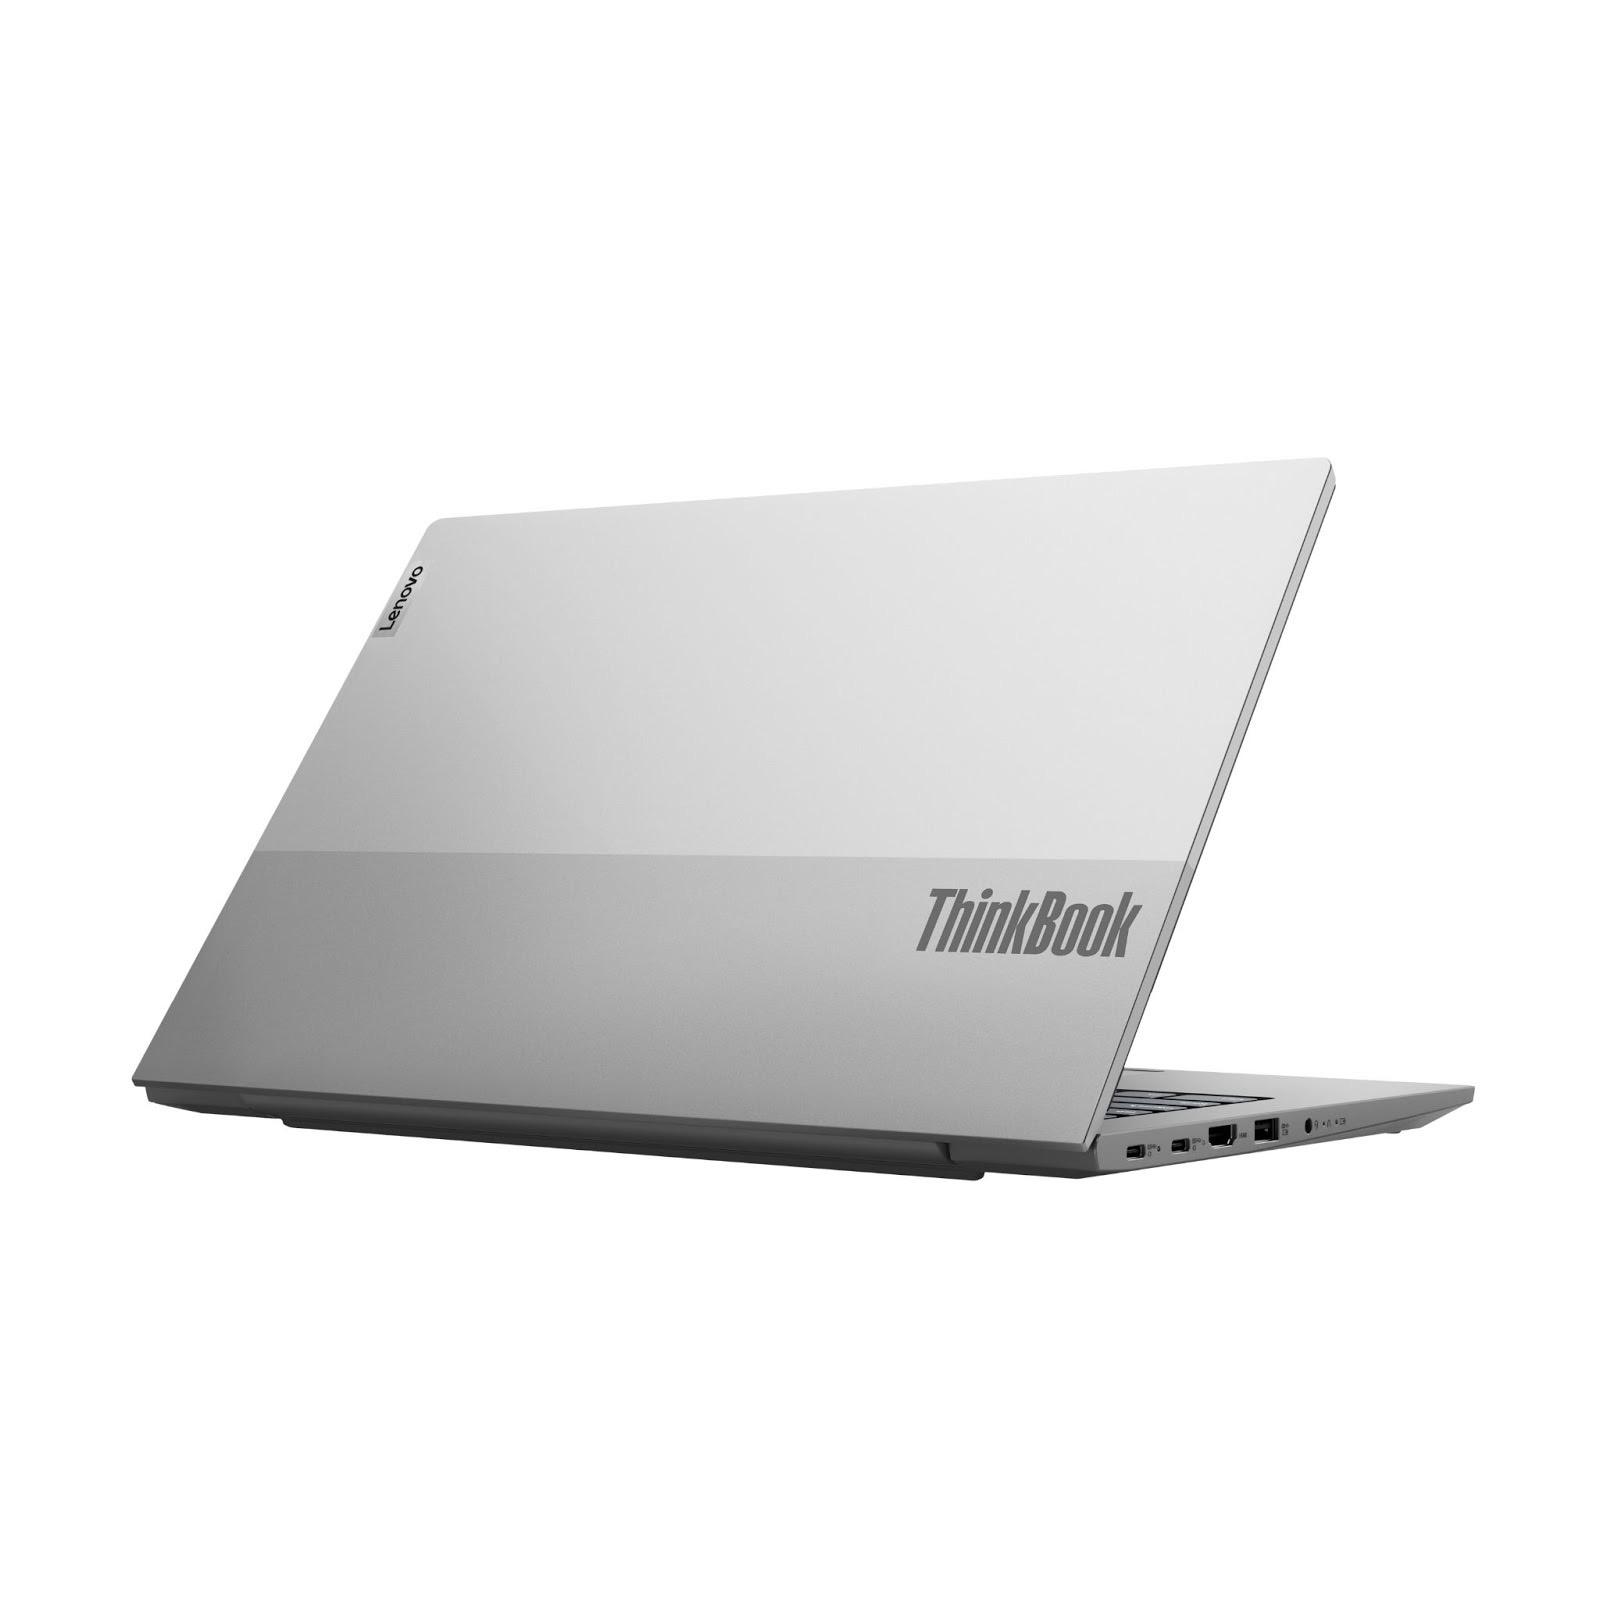 Фото 2. Ноутбук Lenovo ThinkBook 14 Gen 2 ARE Mineral Grey (20VF0039RU)